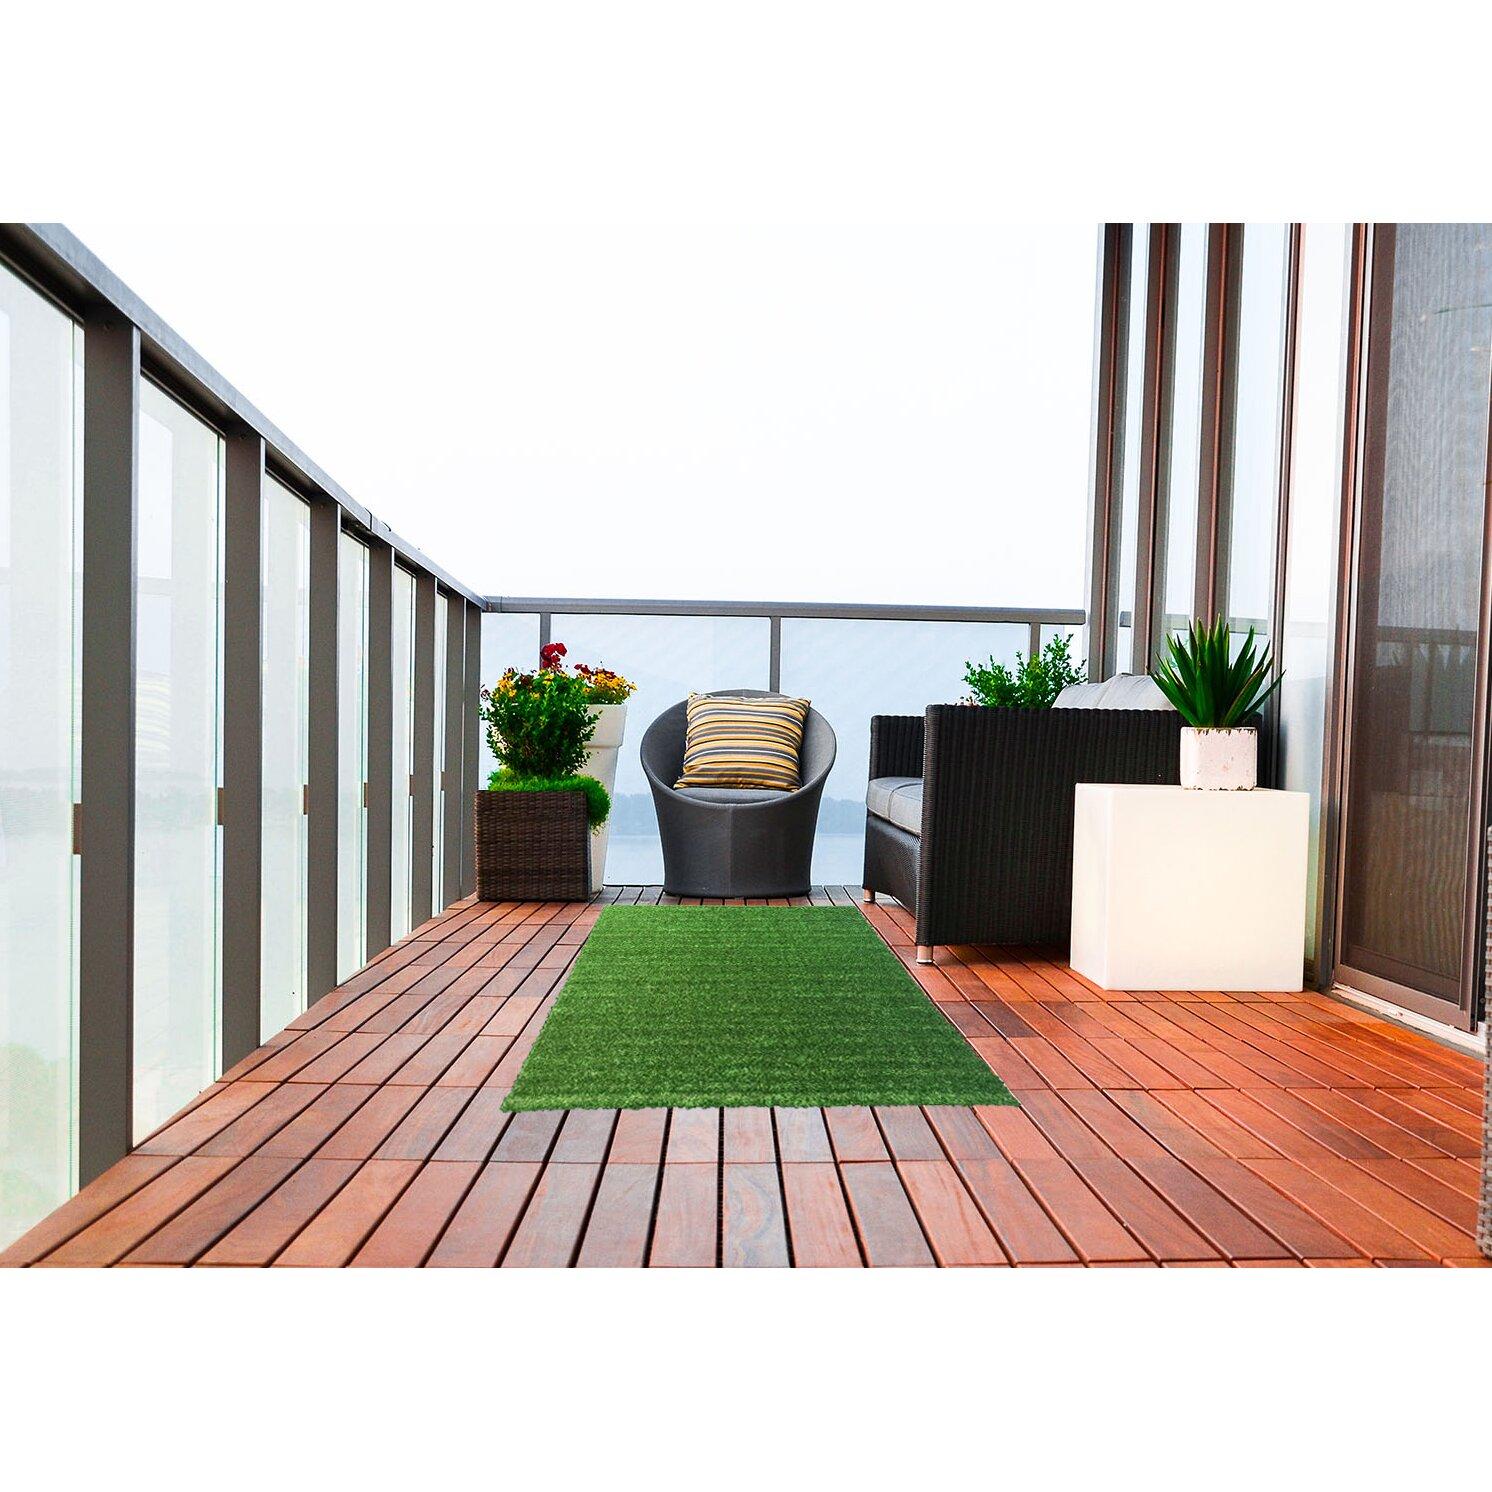 Throw Rugs Secure: Ottomanson Garden Grass Green Indoor/Outdoor Area Rug